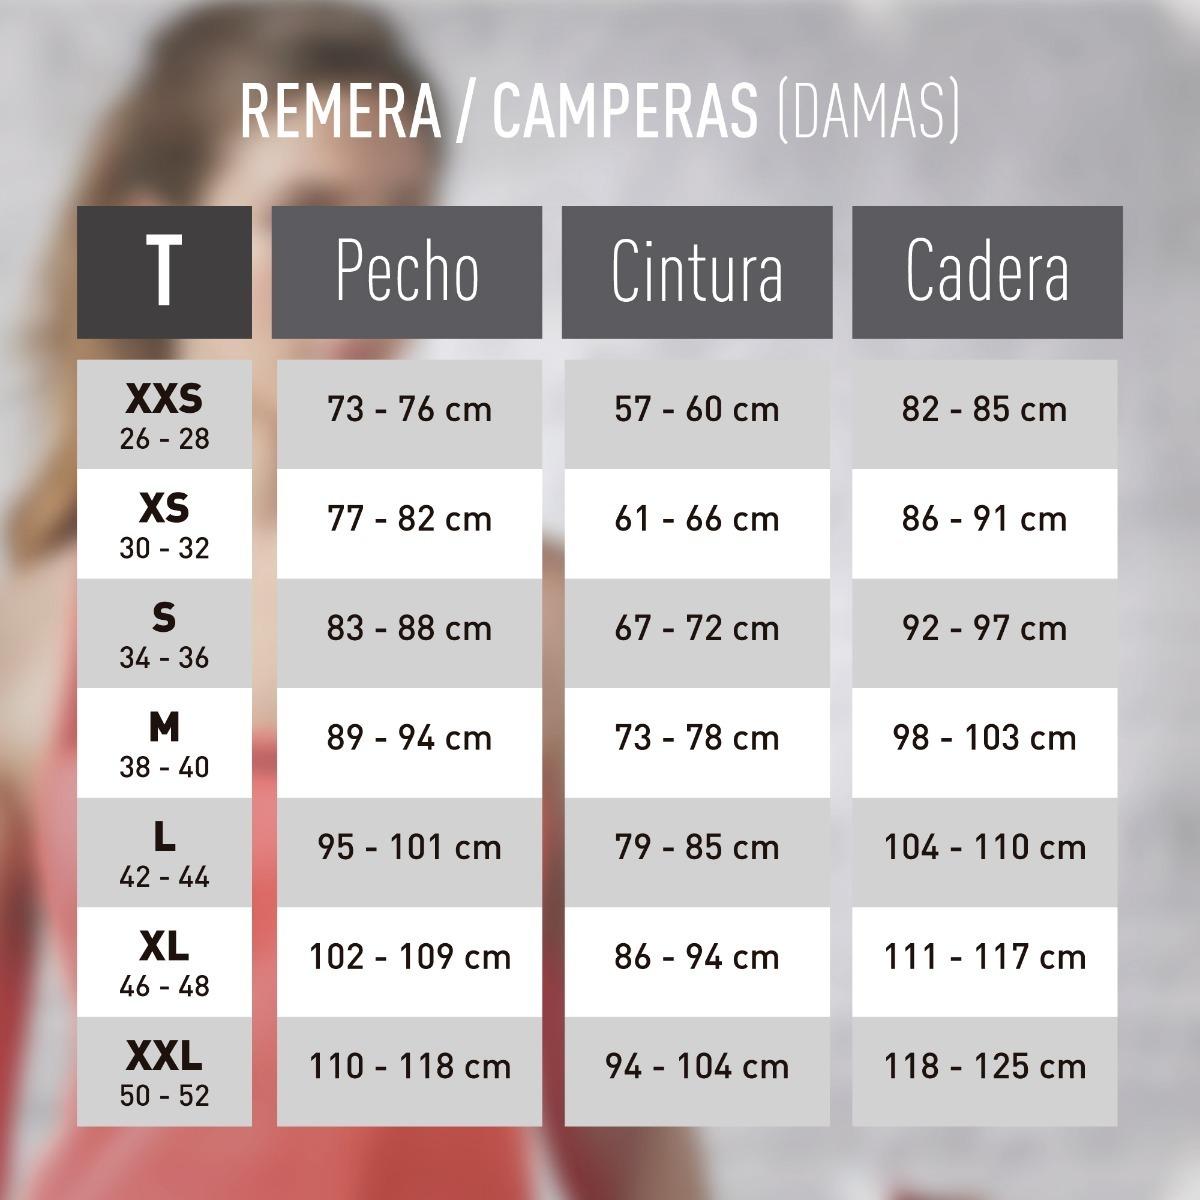 Campera New Balance Essentials Brush Fz Wj83506 De Mujer